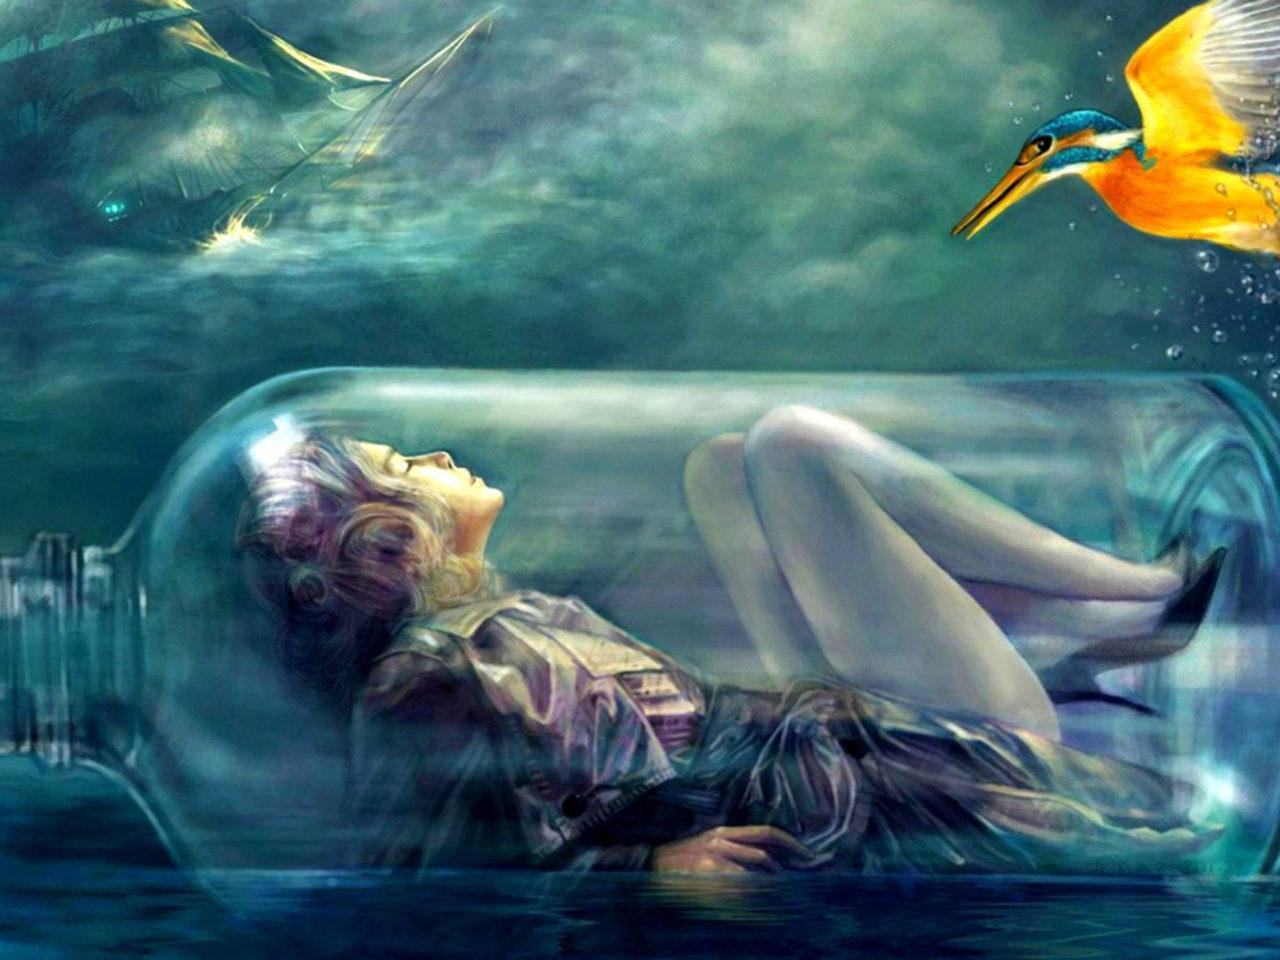 Red Dragon Girl Wallpaper Girl In A Glass Bottle Sea Ocean Bird Fantasy Hd Wallpaper